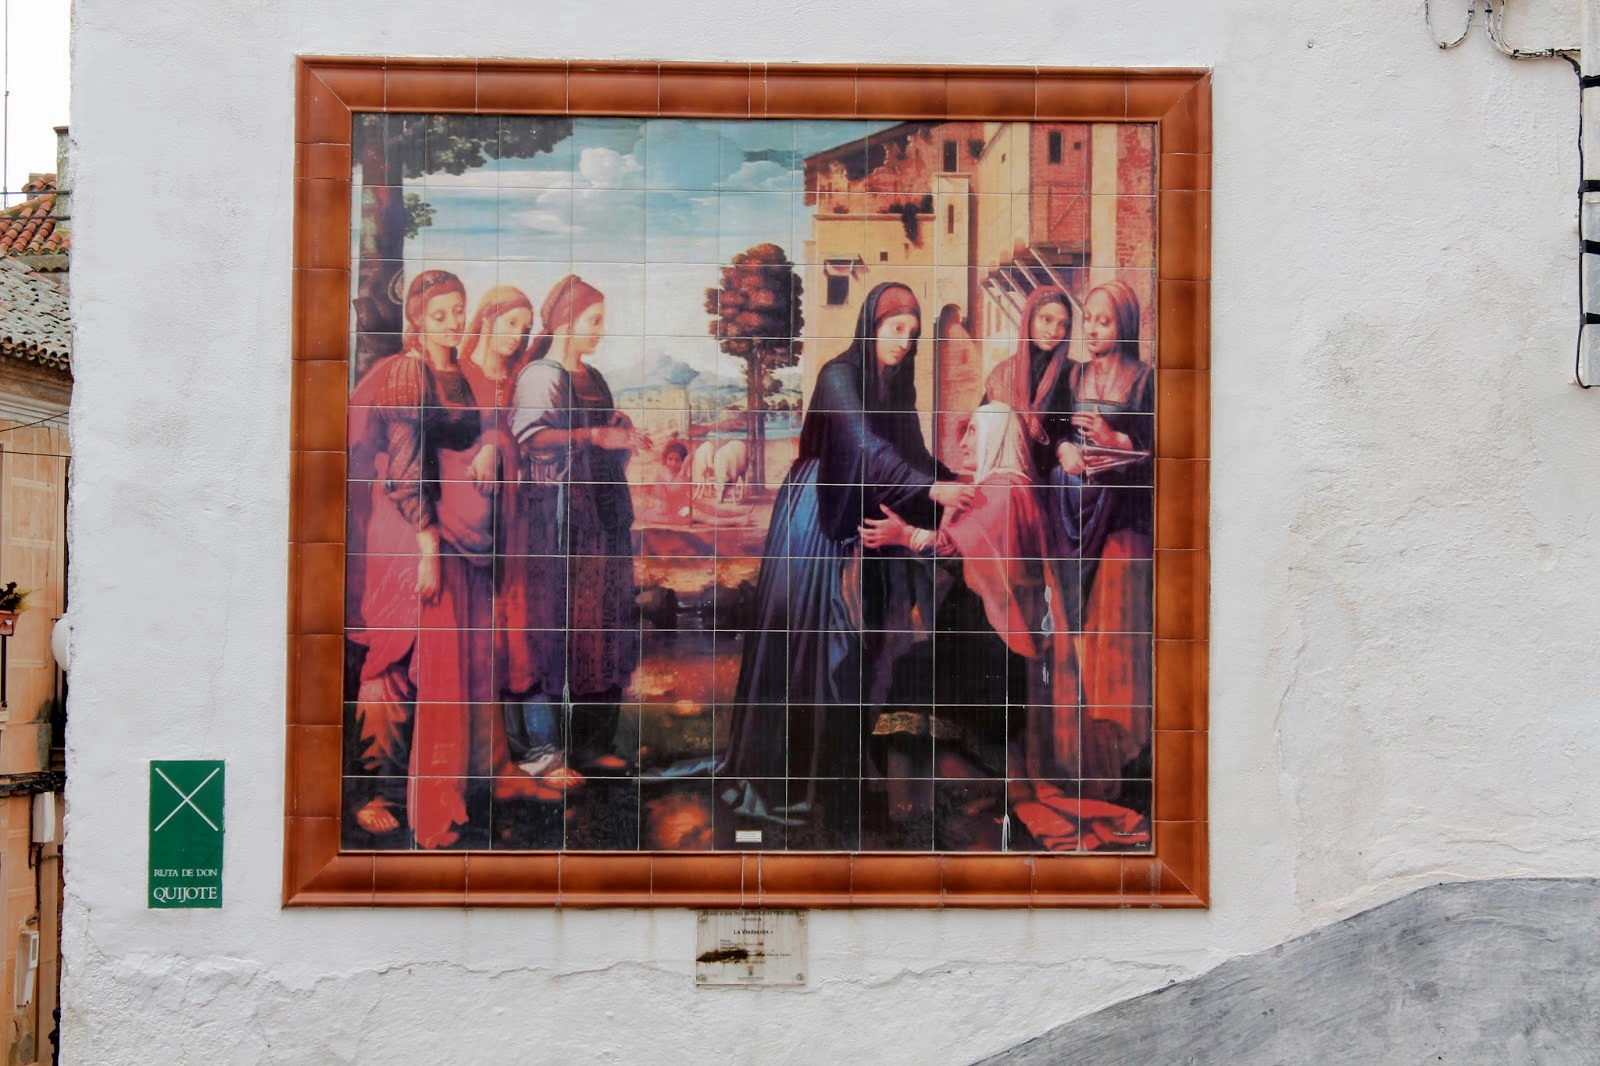 Museo al aire libre de Almedina